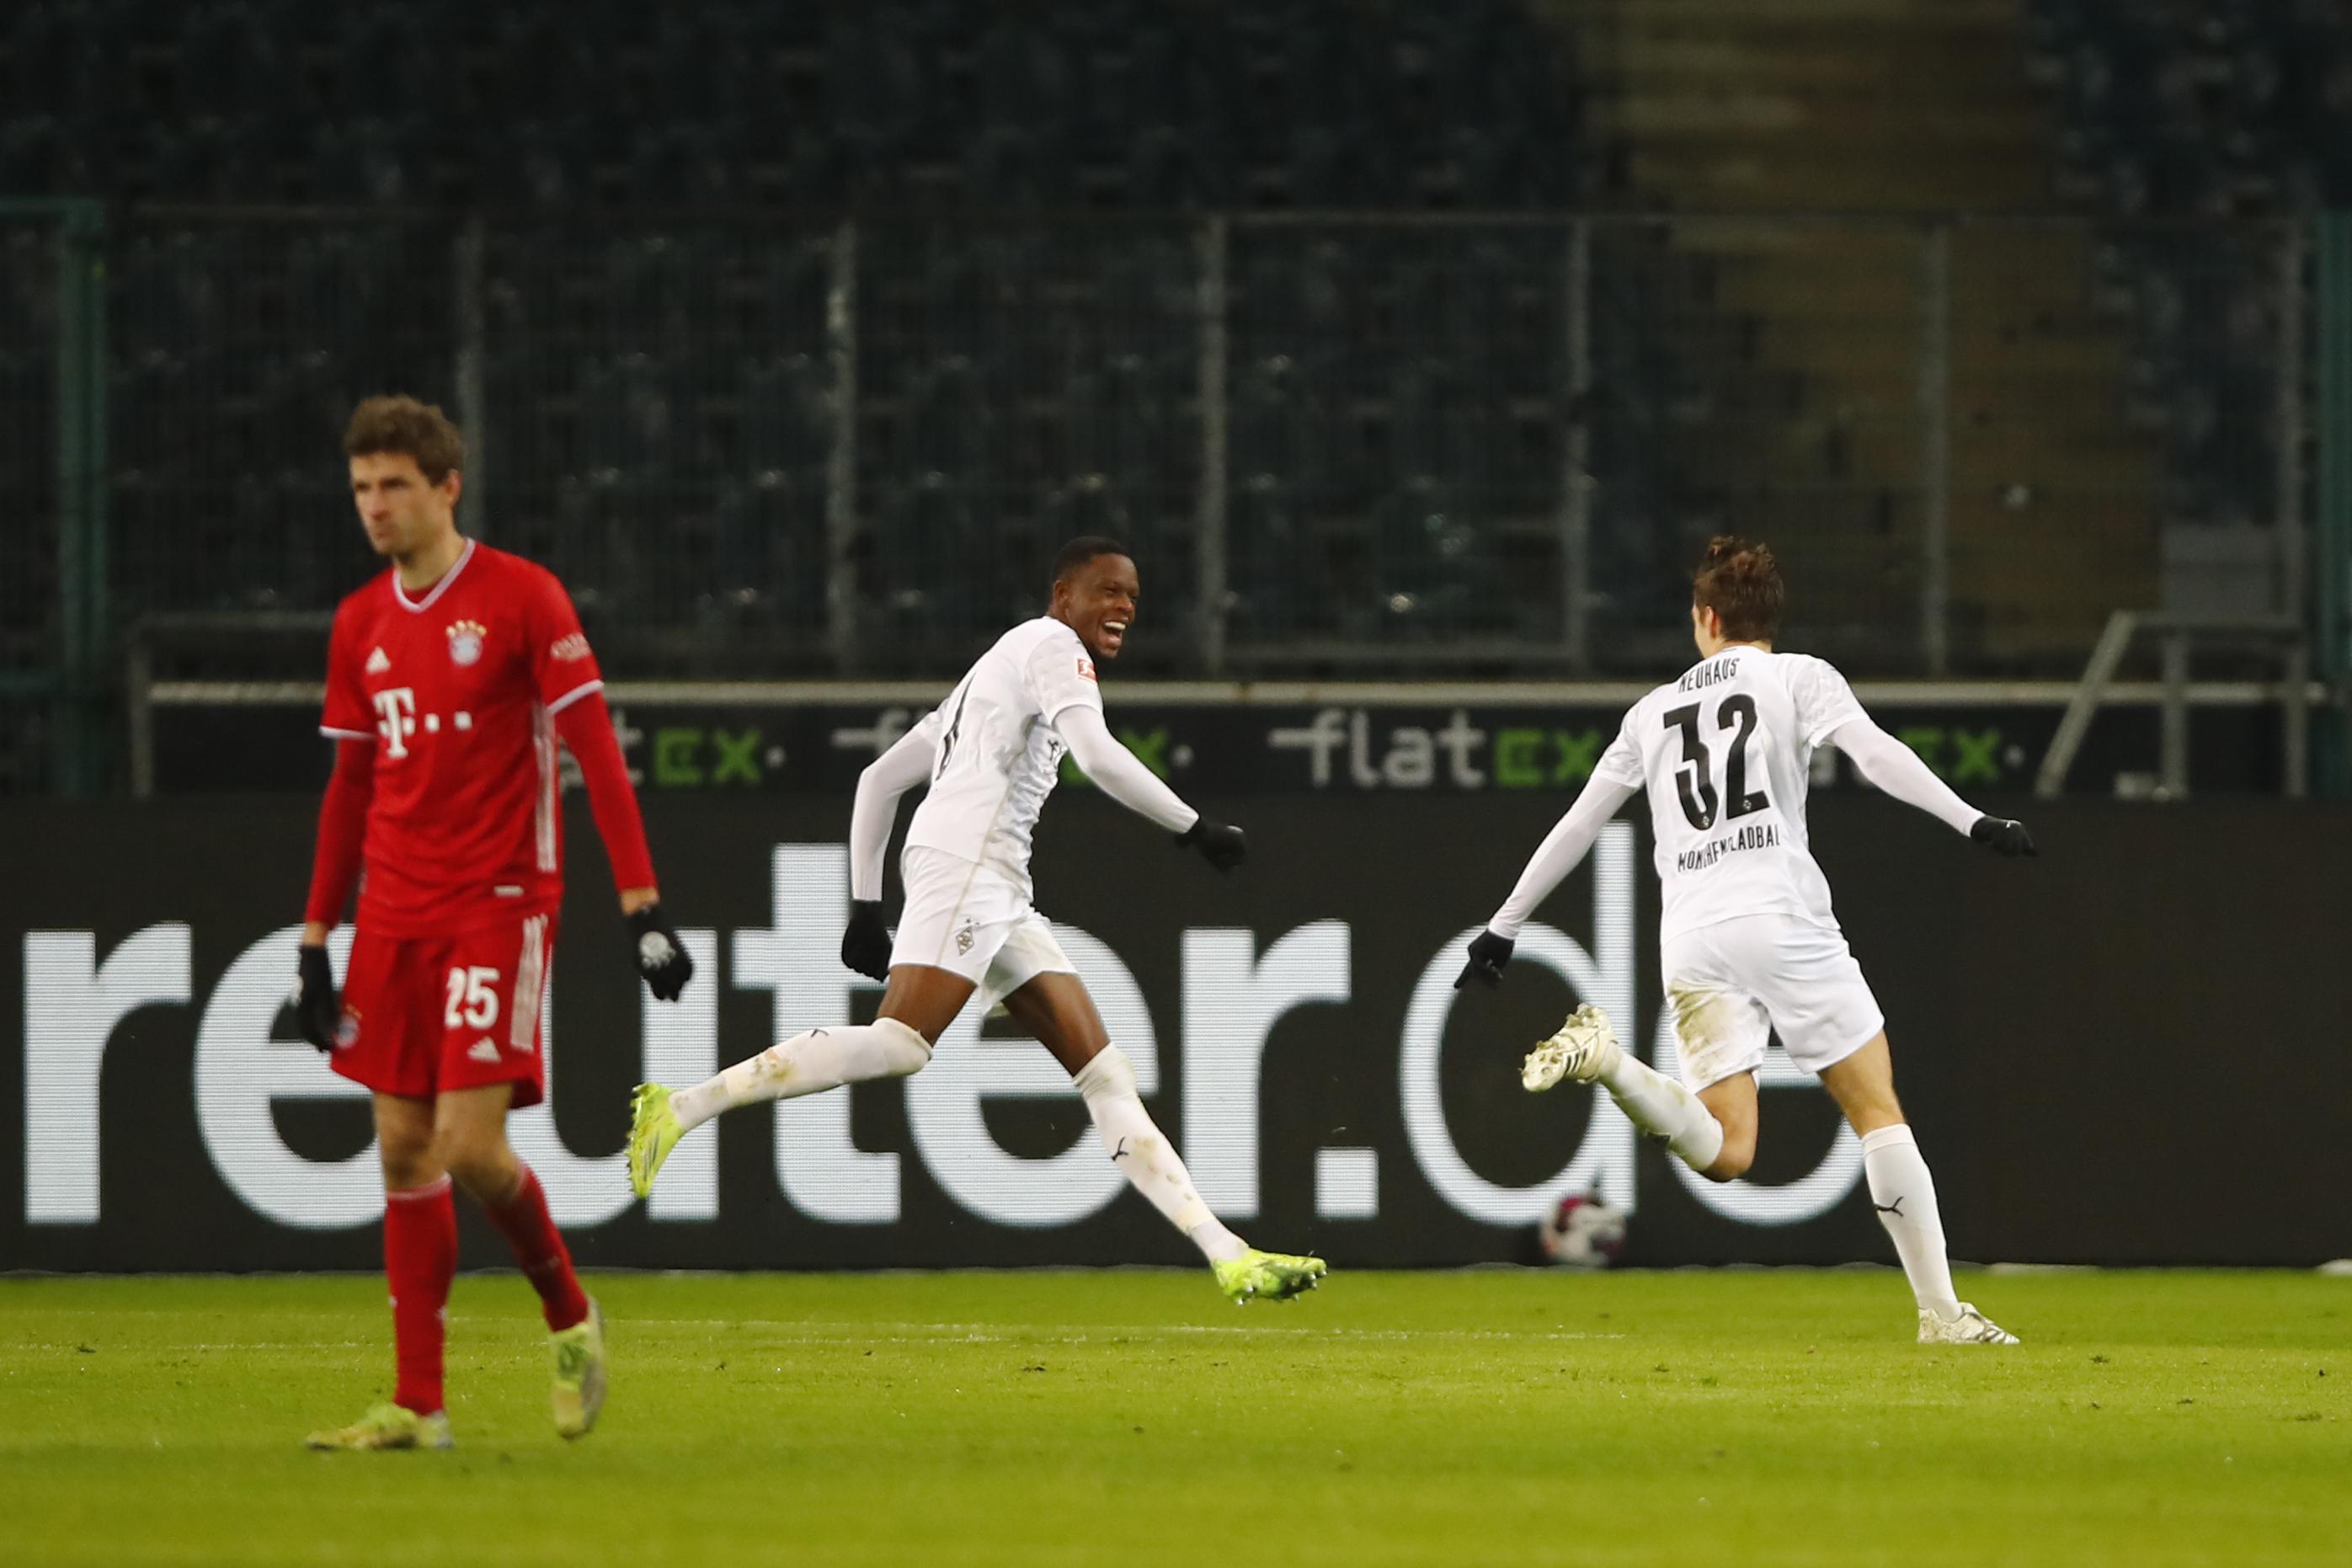 Bayern Munich Player Ratings Vs Gladbach - Awful display from the Bavarians.